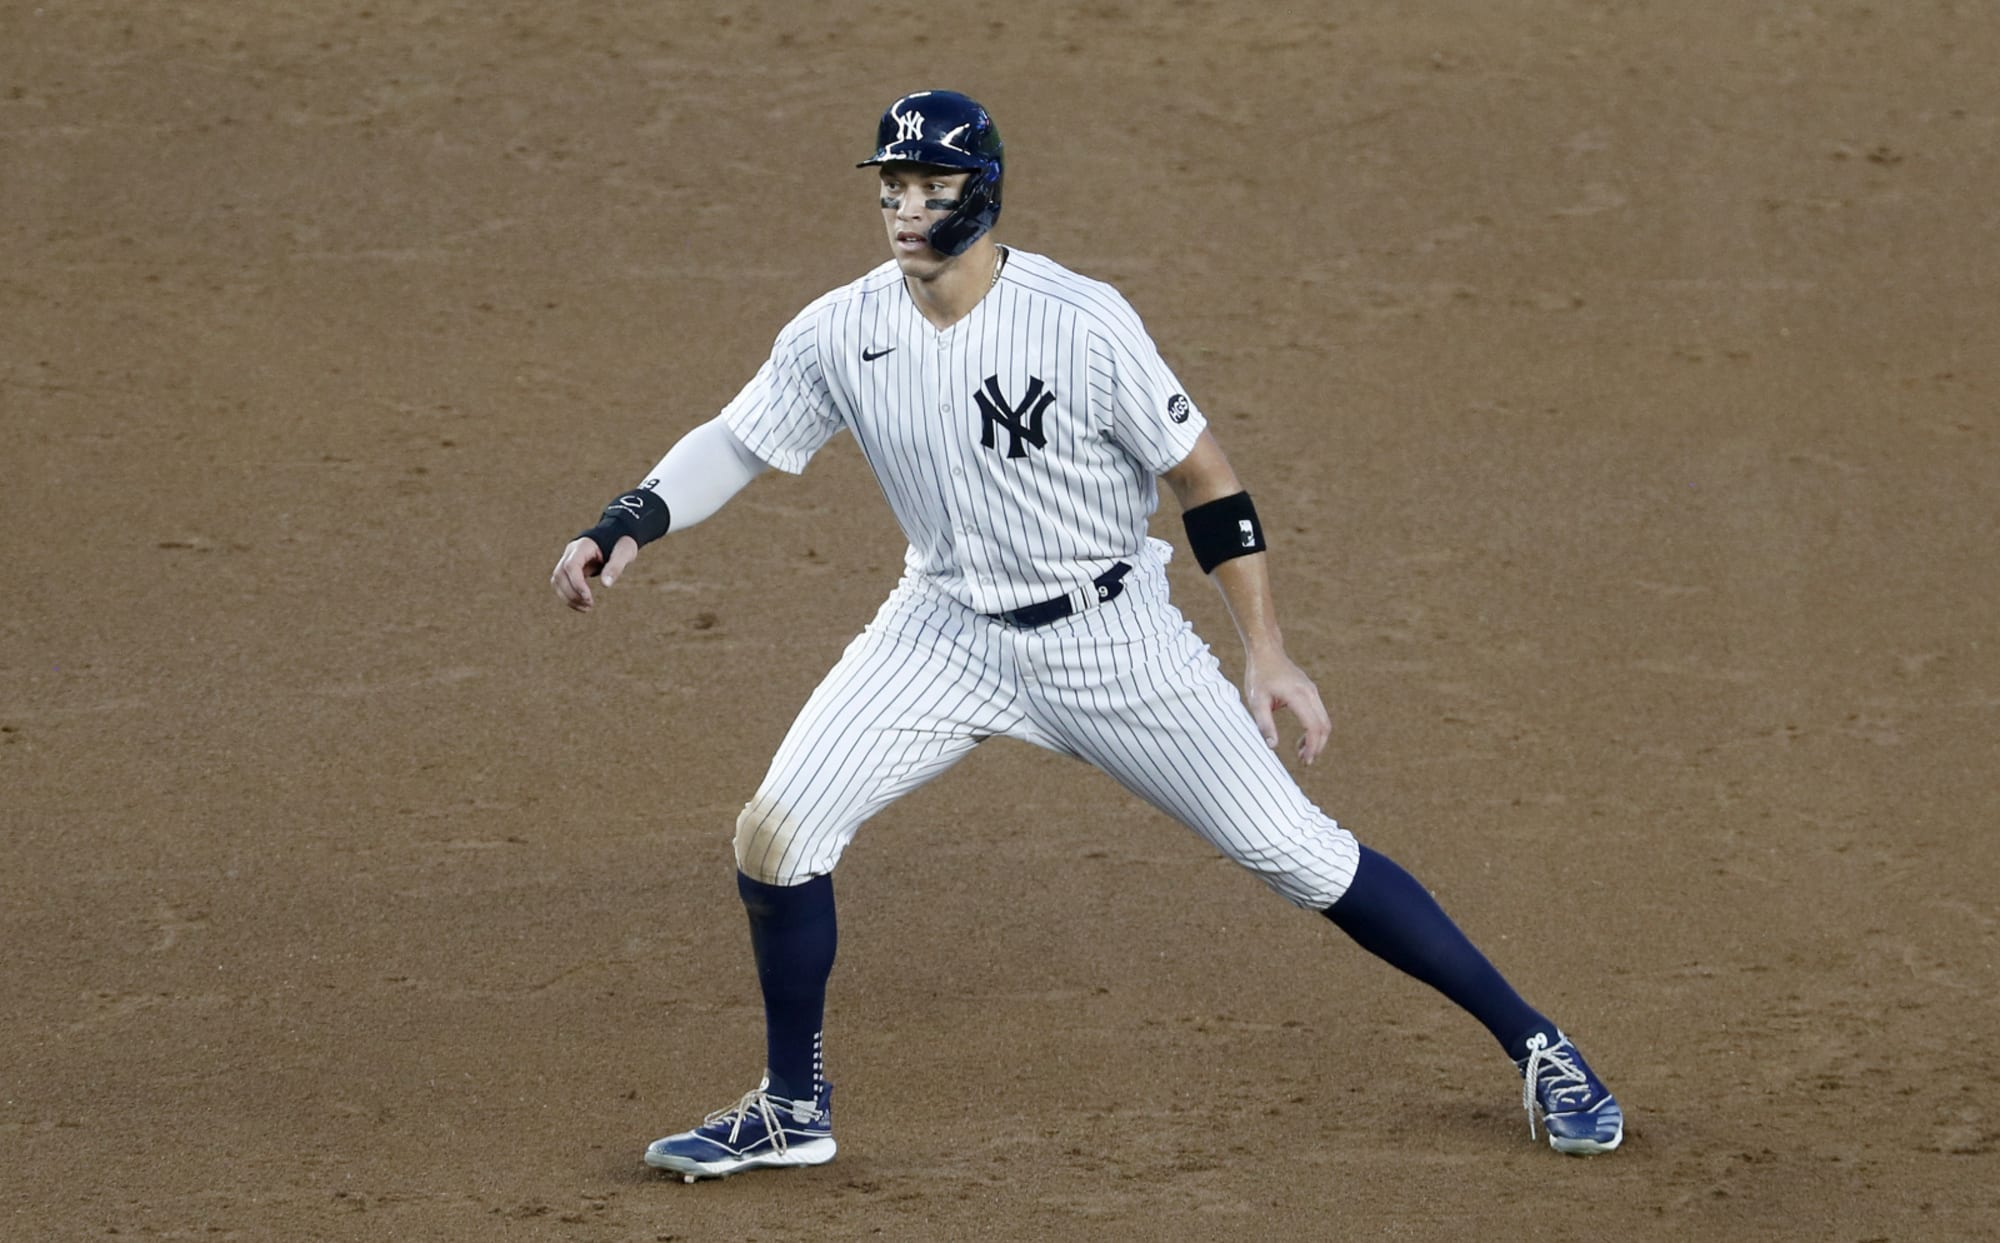 Yankees: Aaron Boone pulling Aaron Judge started disastrous streak